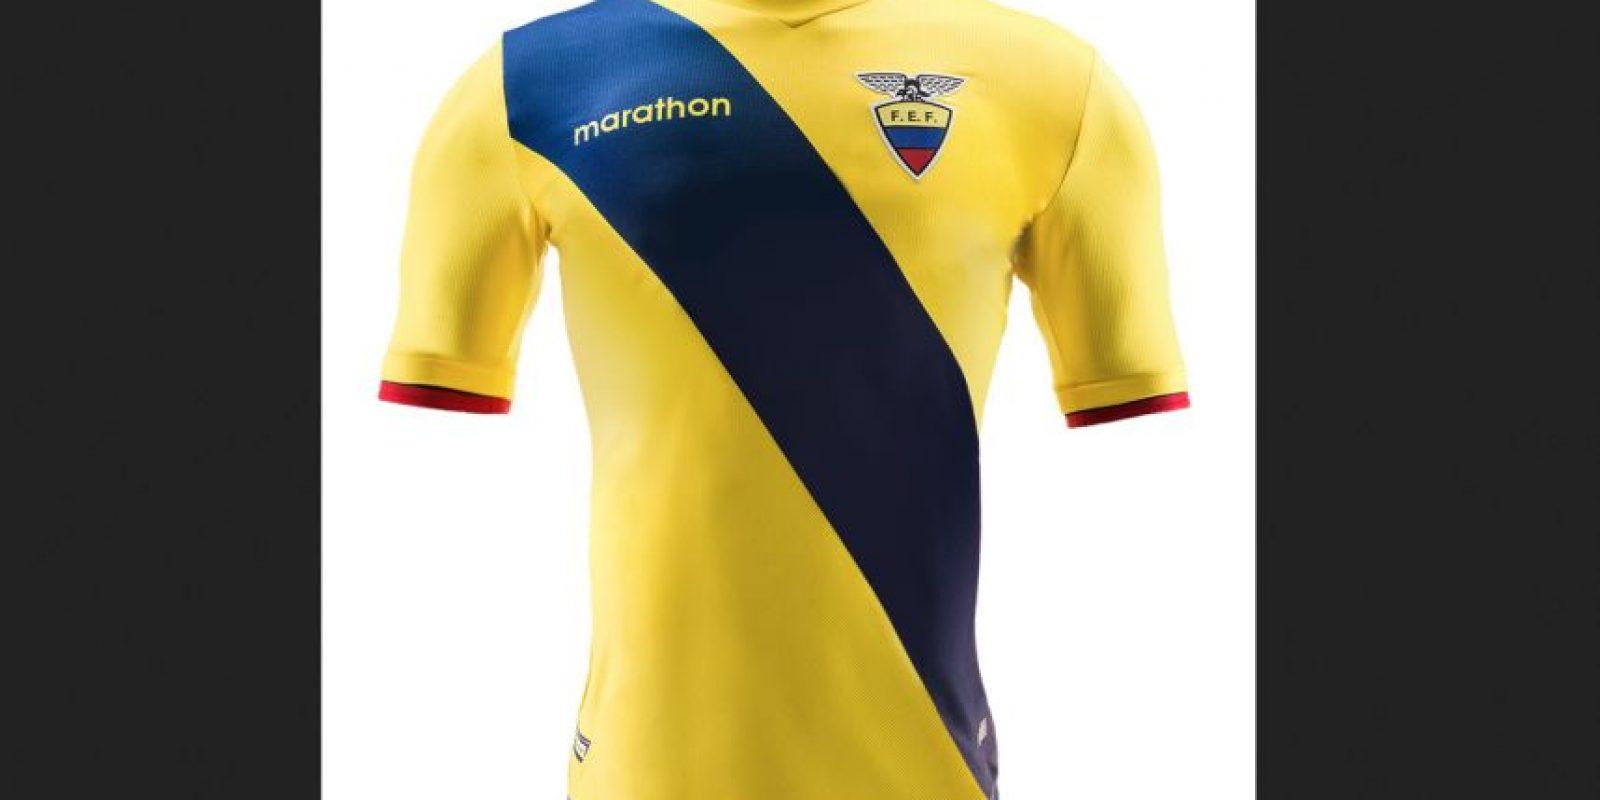 Foto:Tomado de https://marathon-sports.com/personaliza-tu-camiseta/3031/camiseta-oficial-ecuador-copa-centenario-detail.html